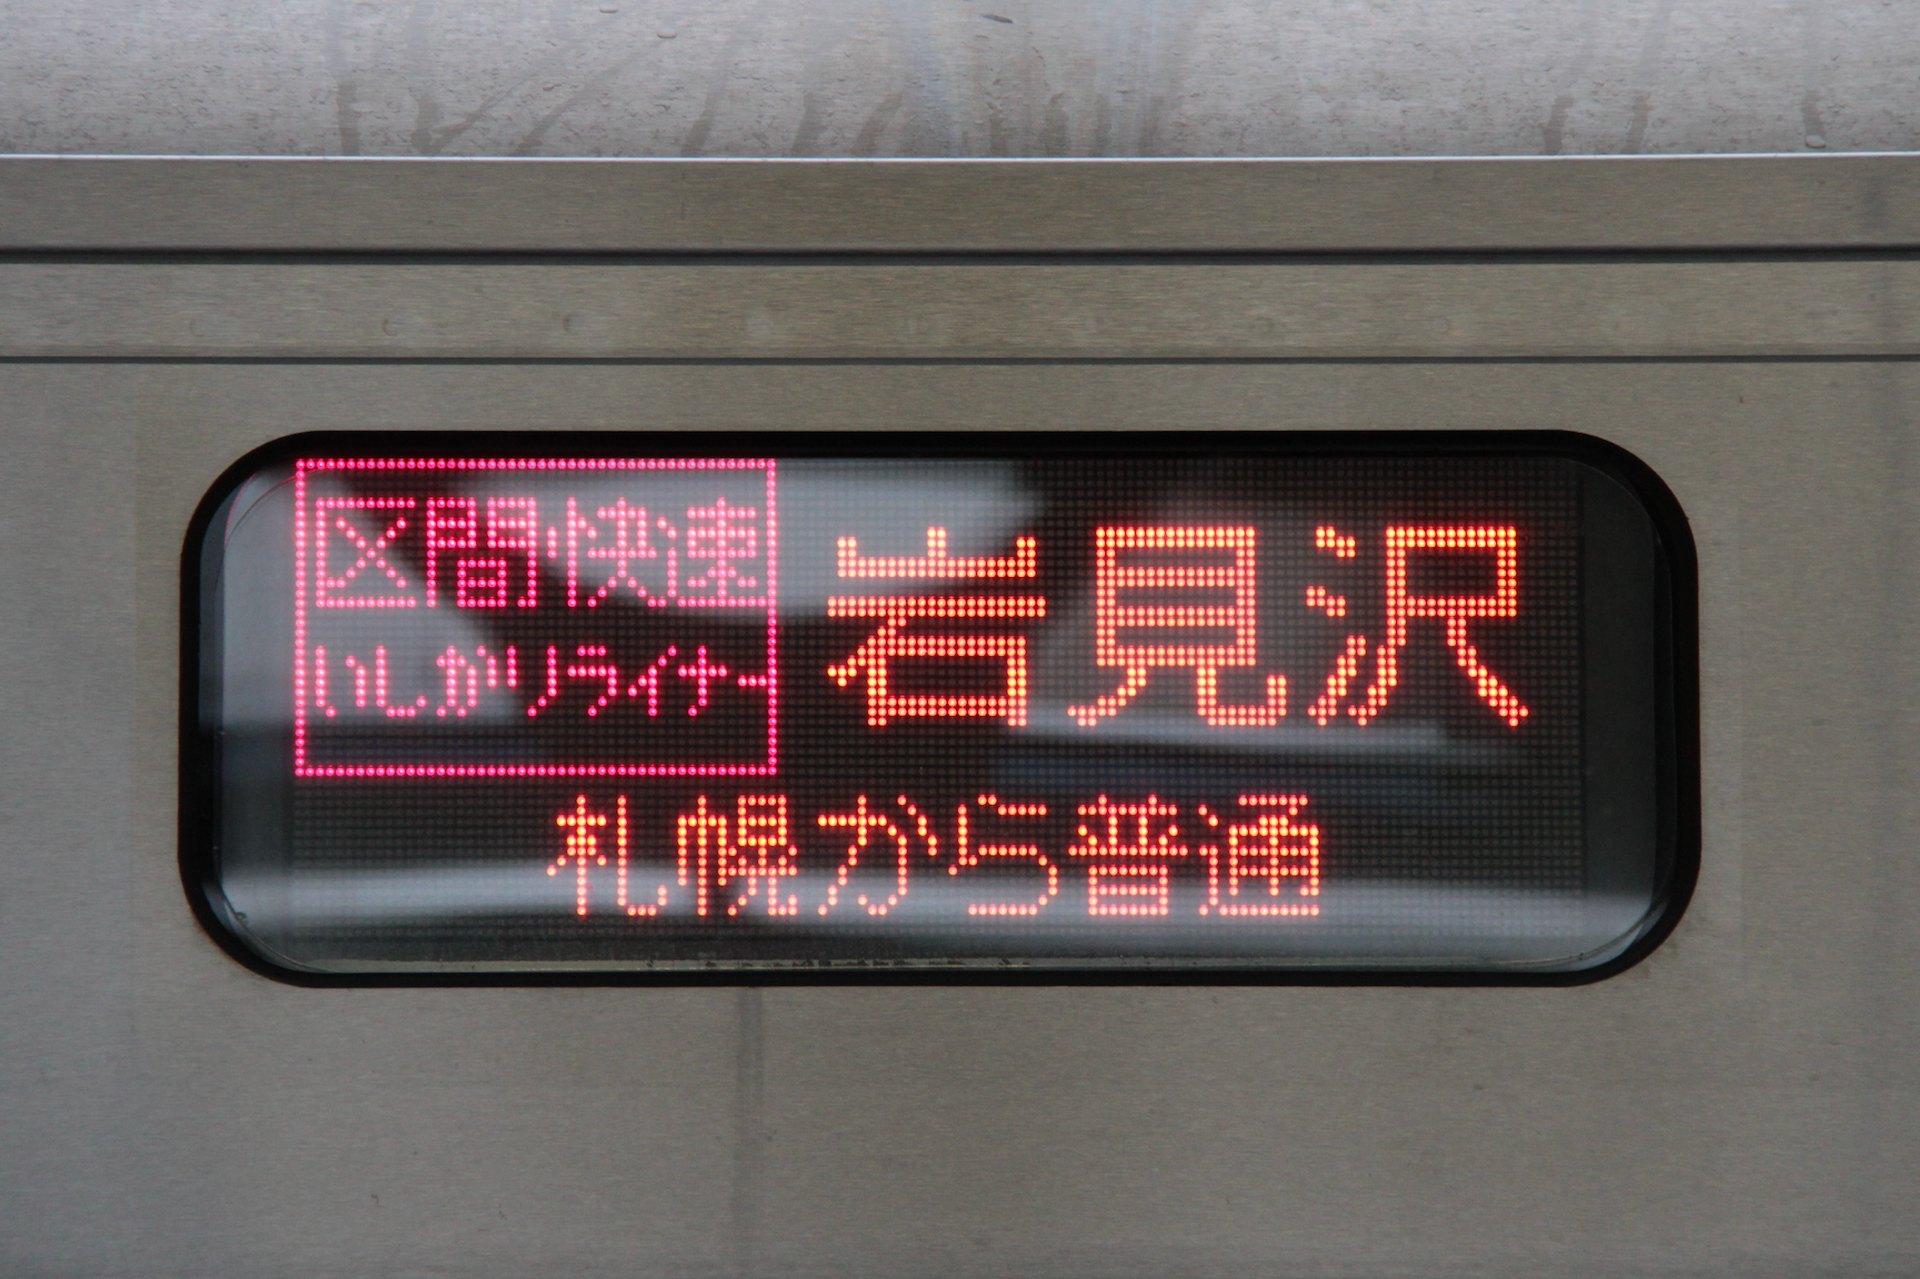 http://crentear.sakura.ne.jp/sblo_files/ninetails/image/IMG_0333.jpg